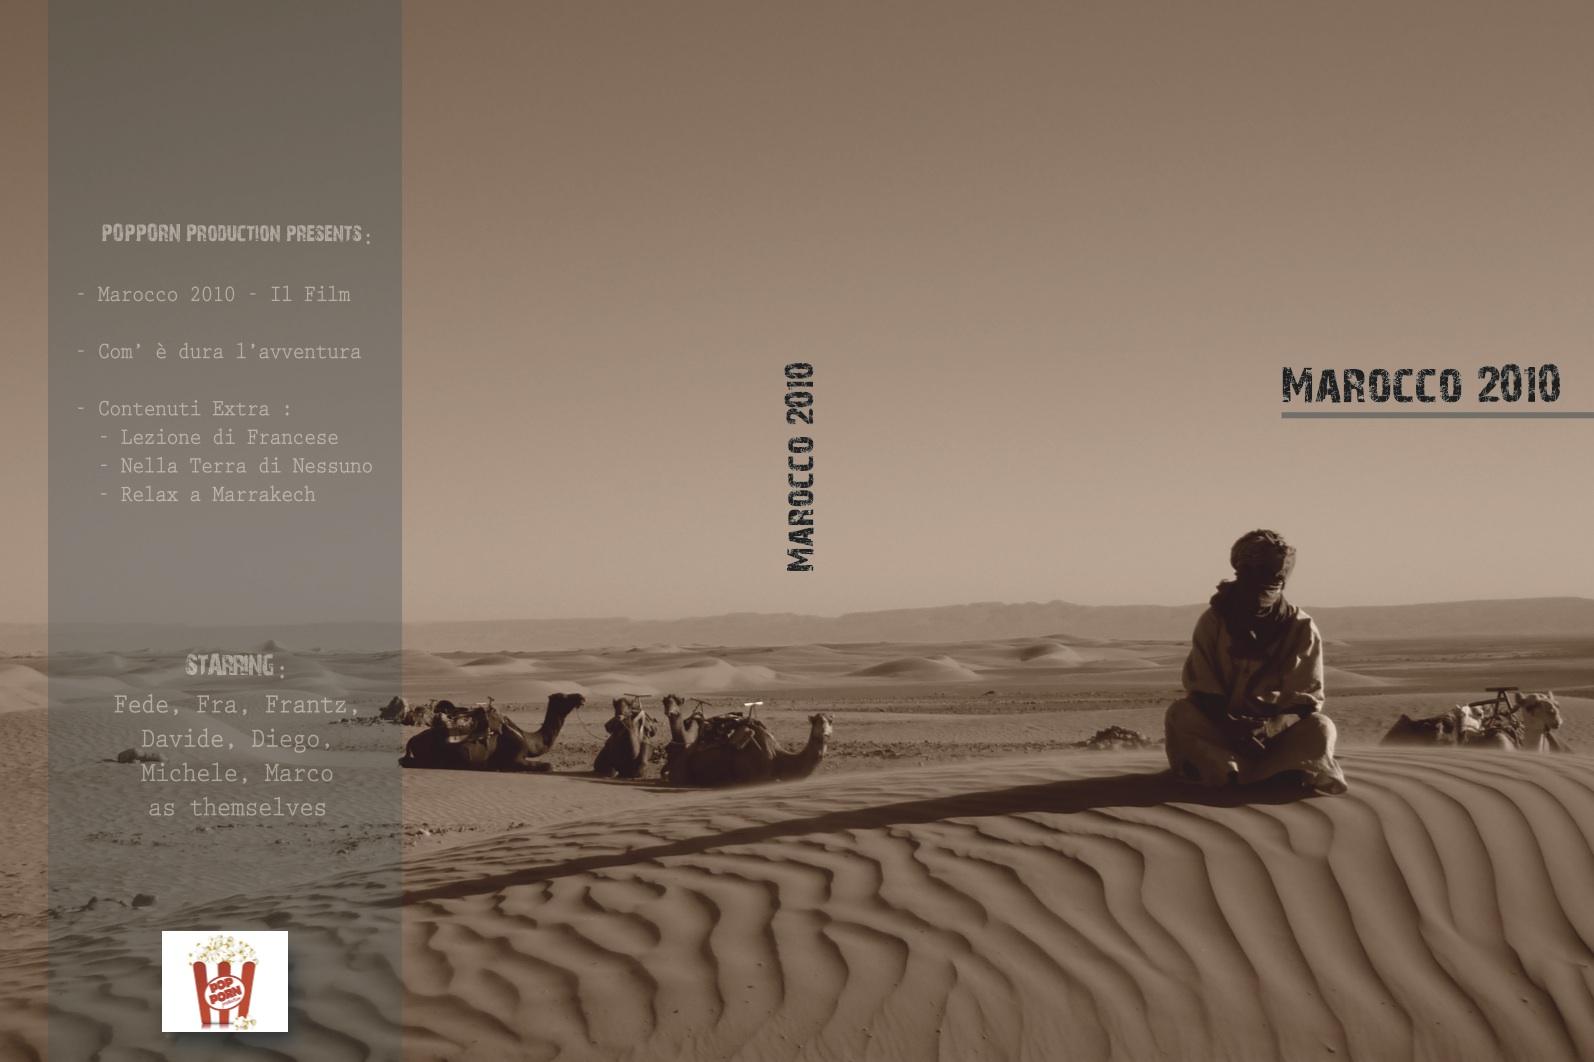 dvd Marocco 2010